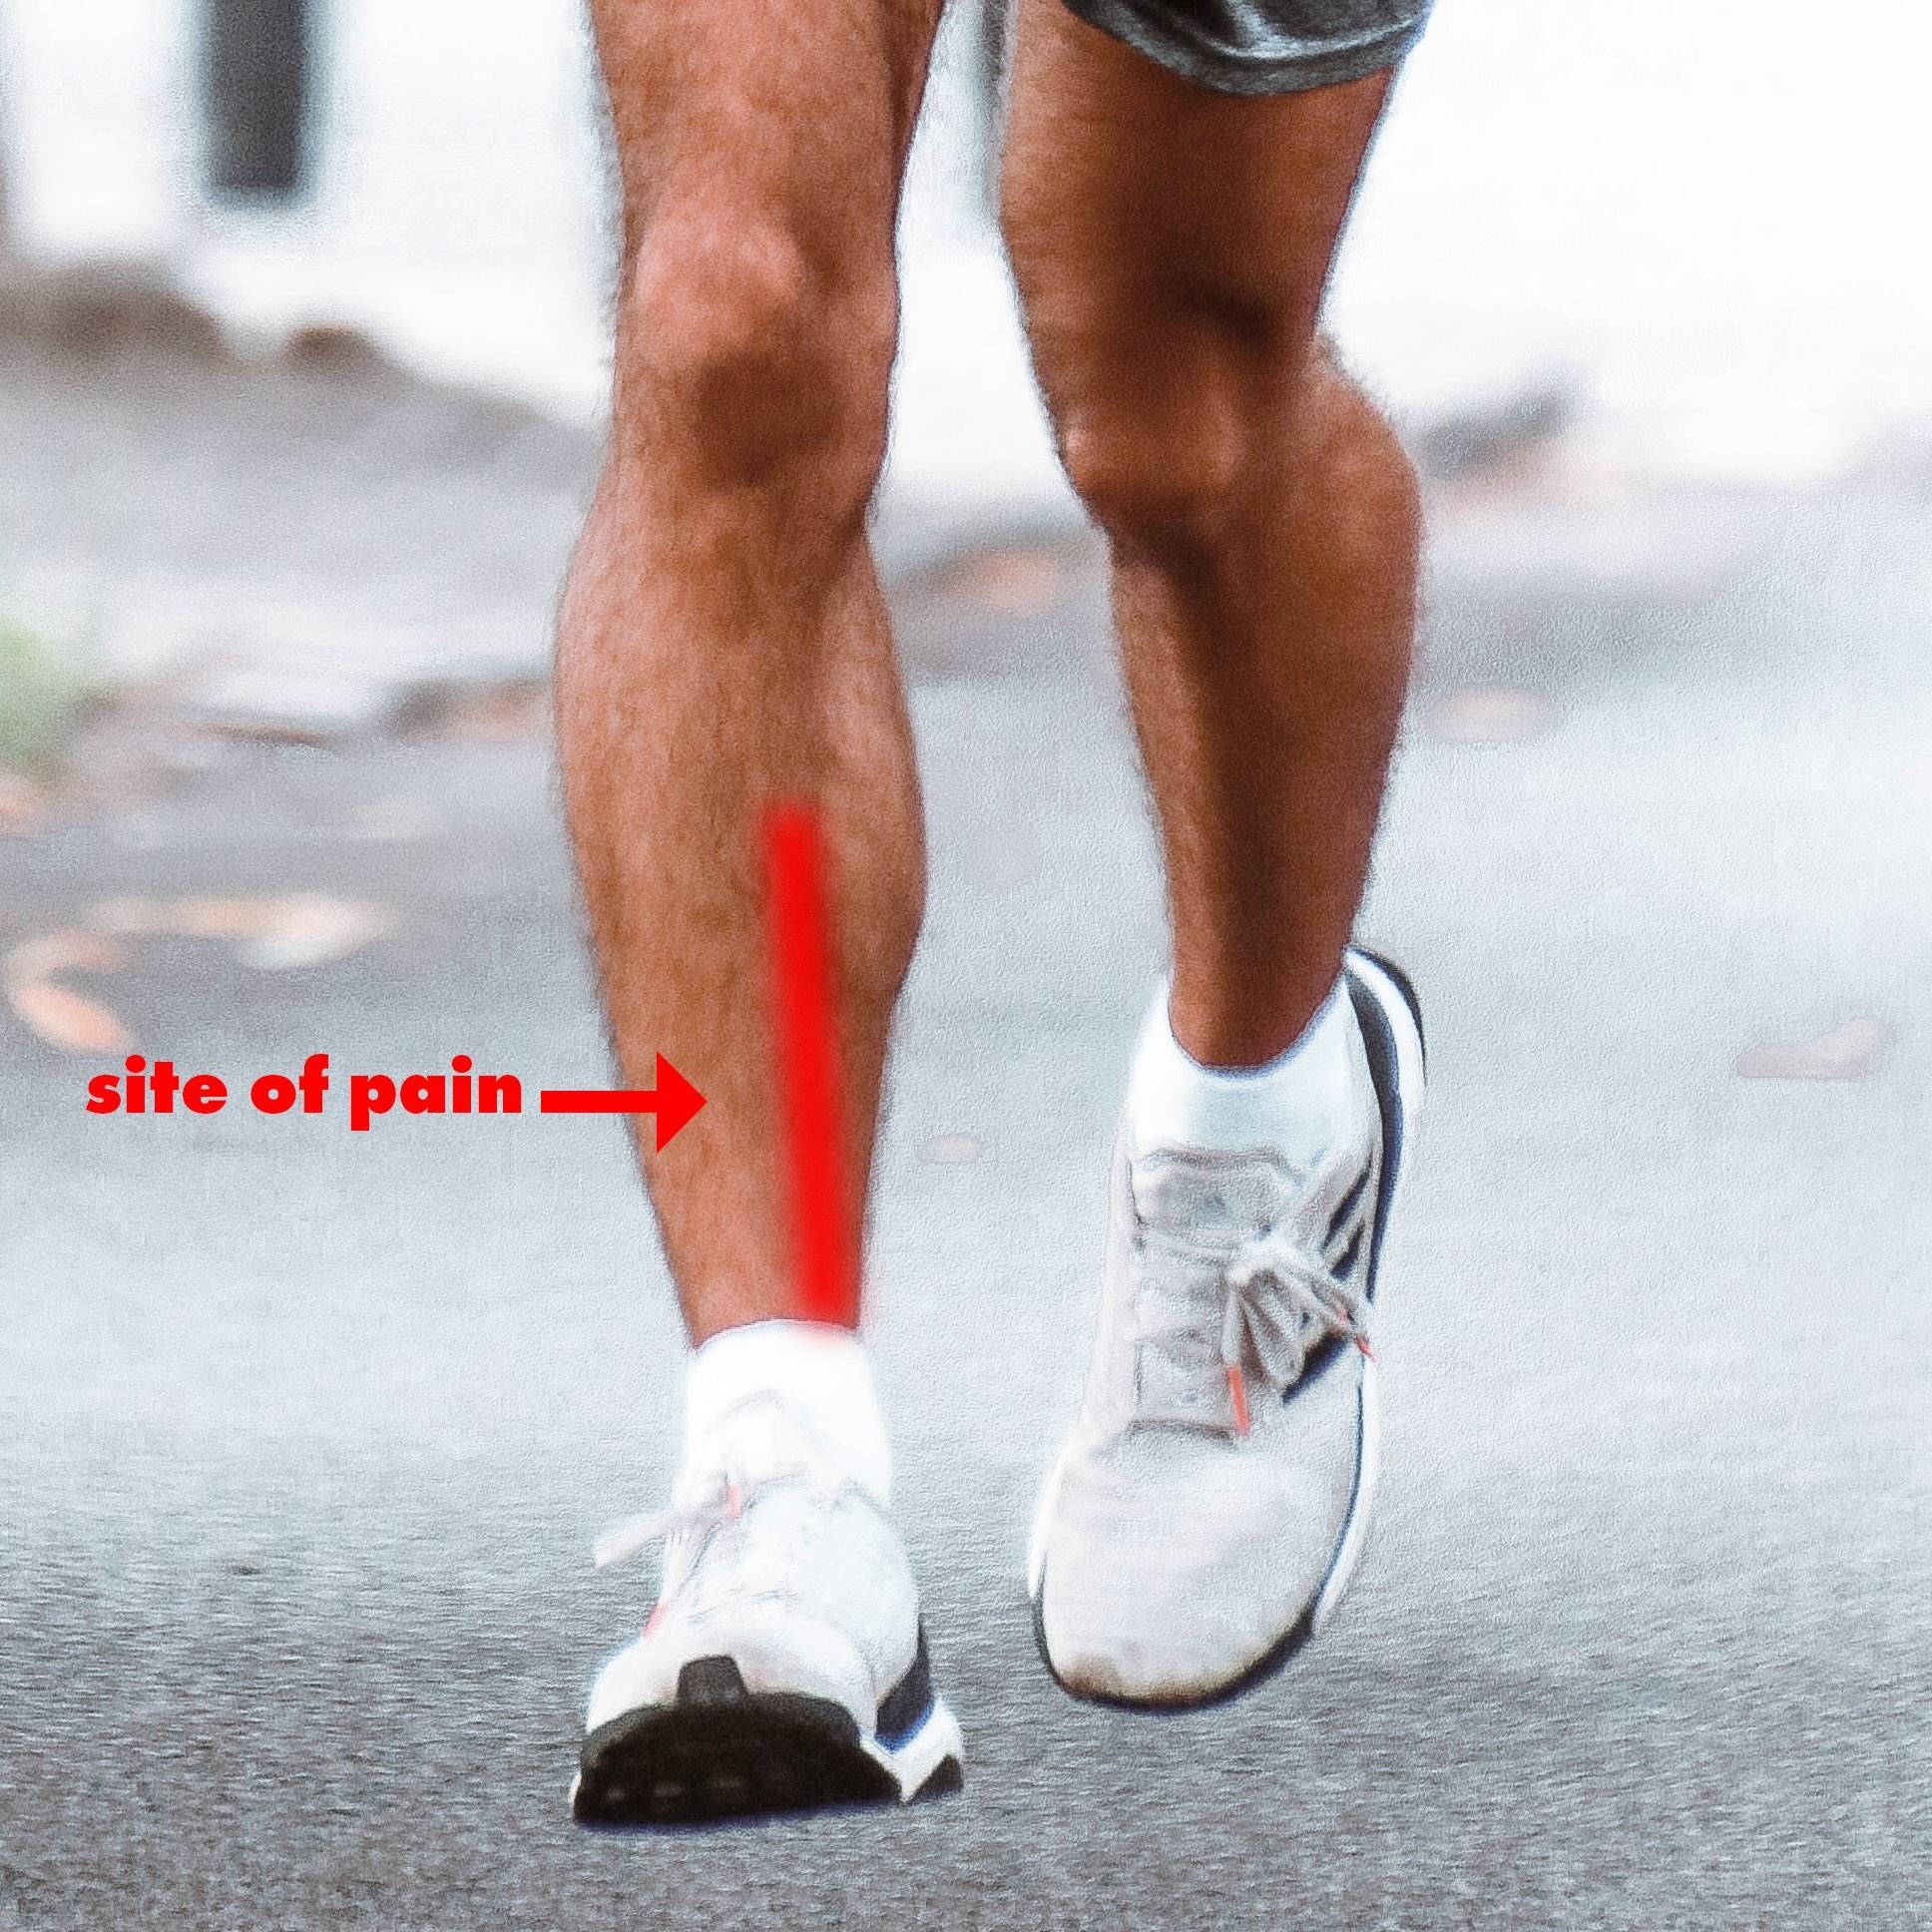 Shin splints cause pain on your shin bone